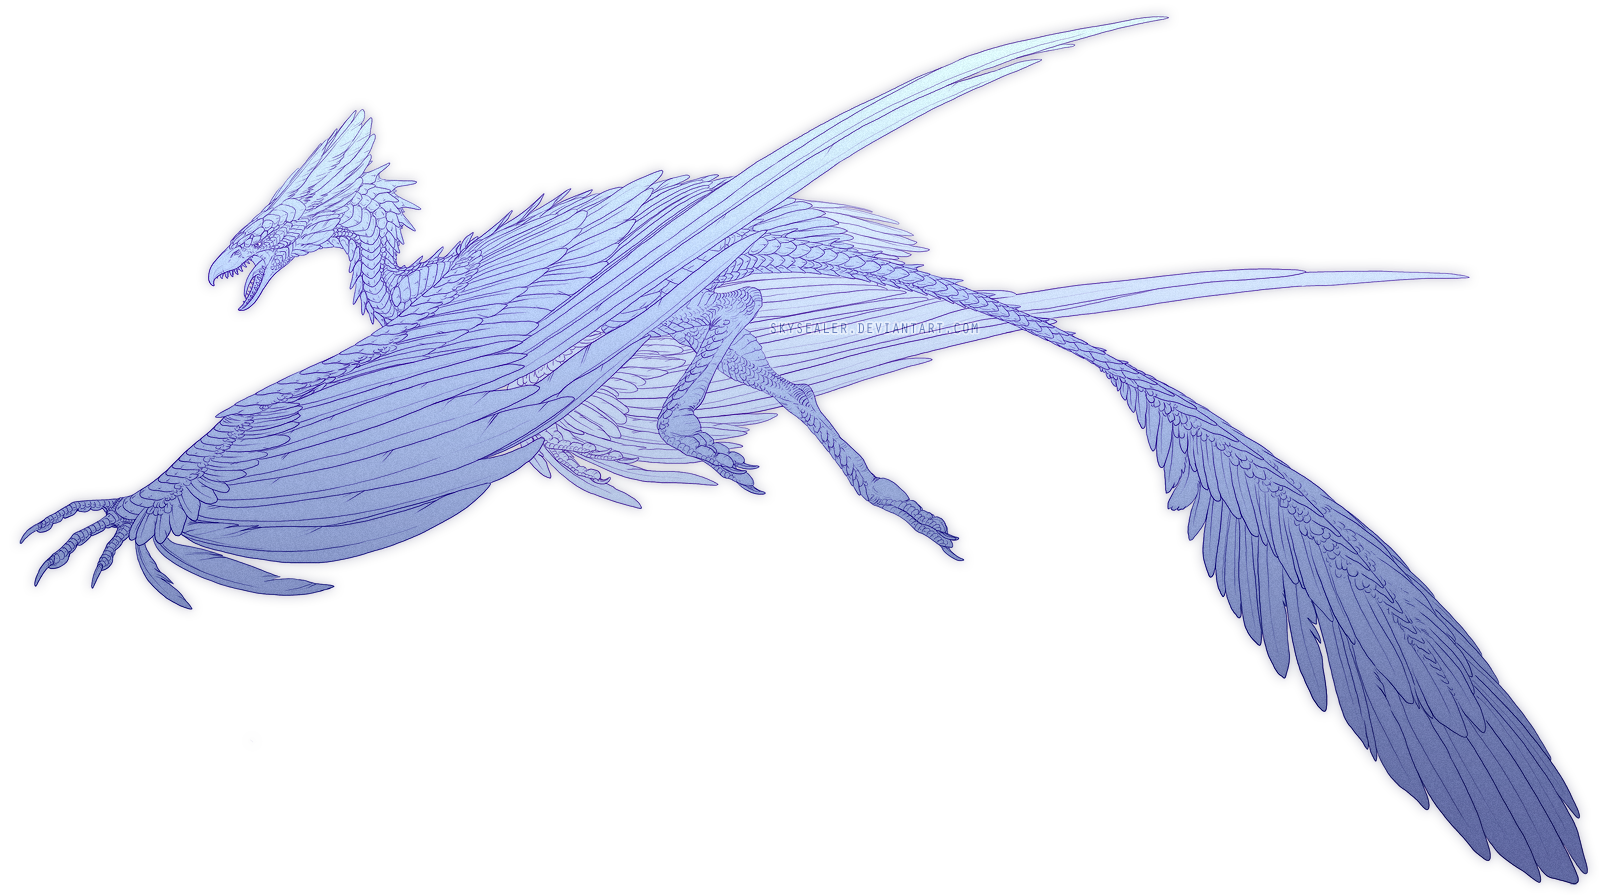 Razor Wind - SKCM by Skysealer